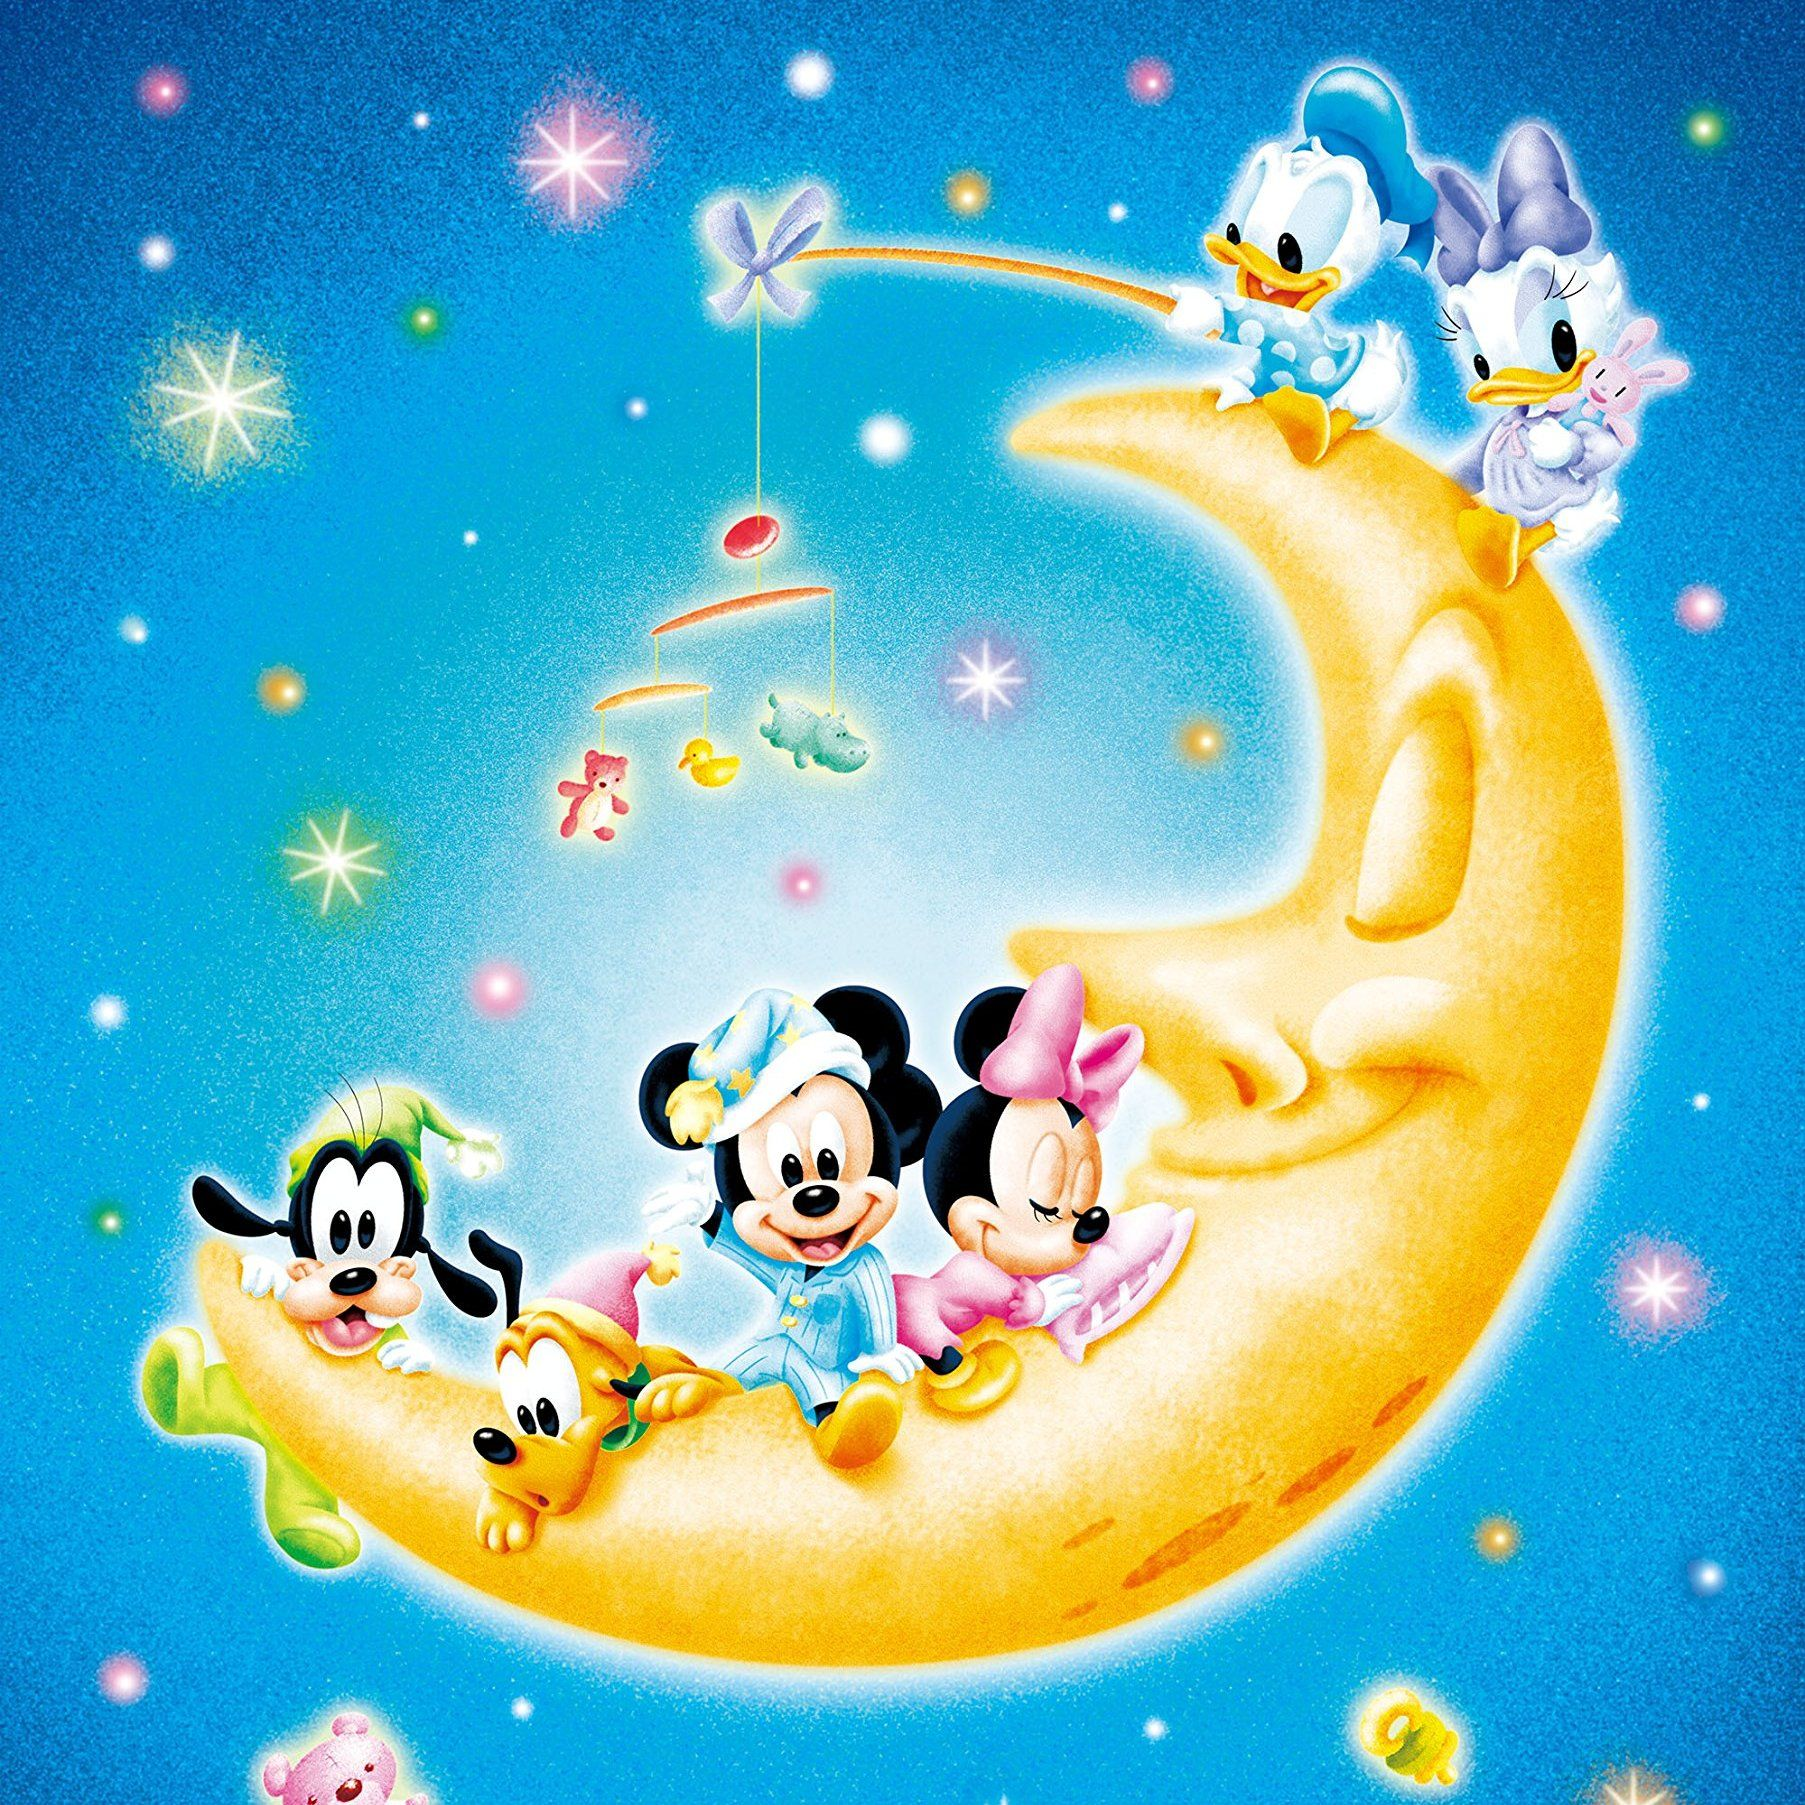 Pin De Marina Em Baby Disney Imagens Fofas Mickey